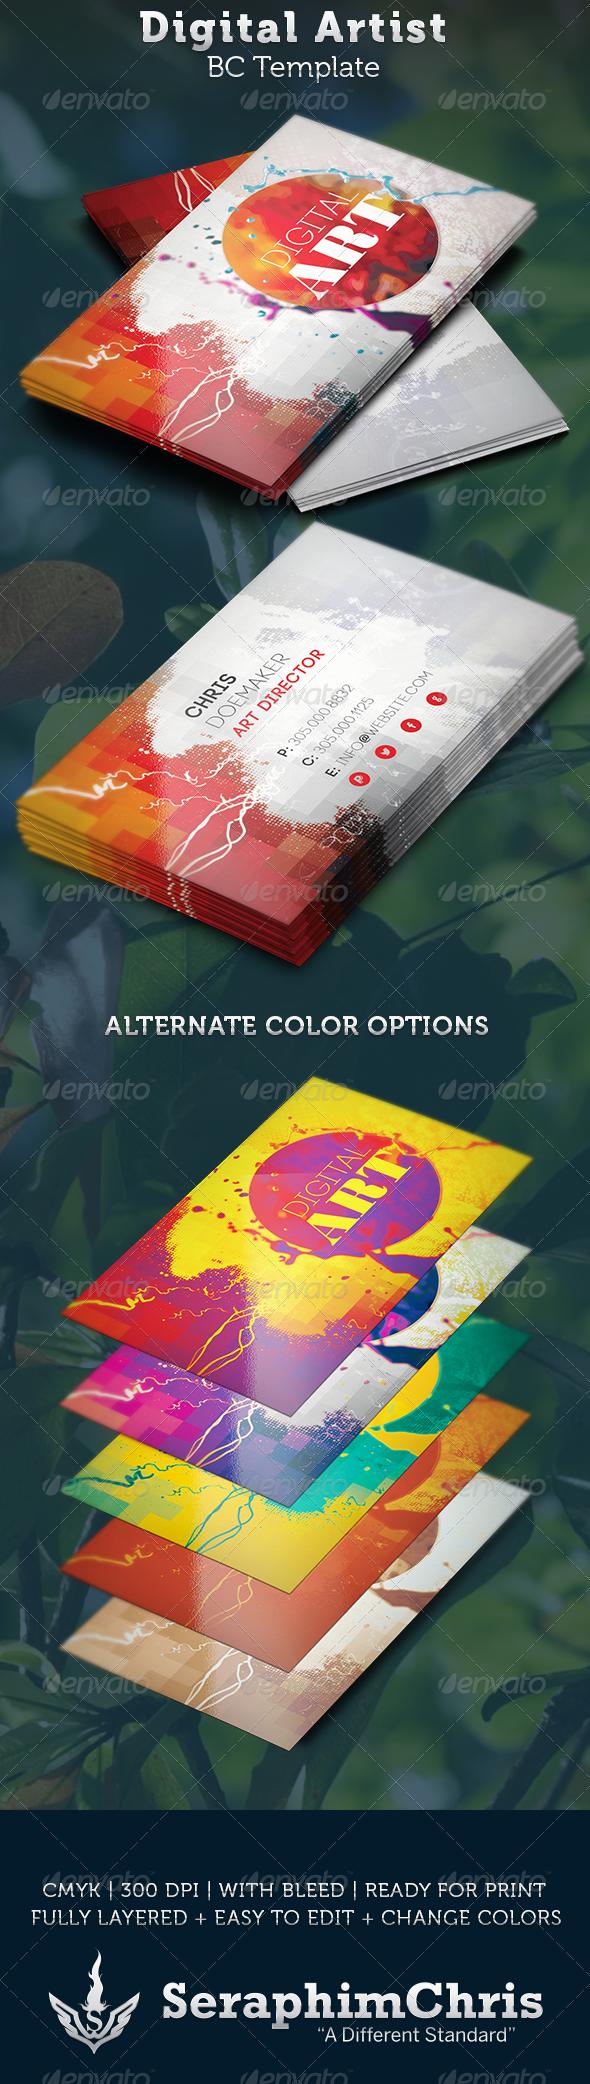 GraphicRiver Digital Artist Business Card Template 3656269